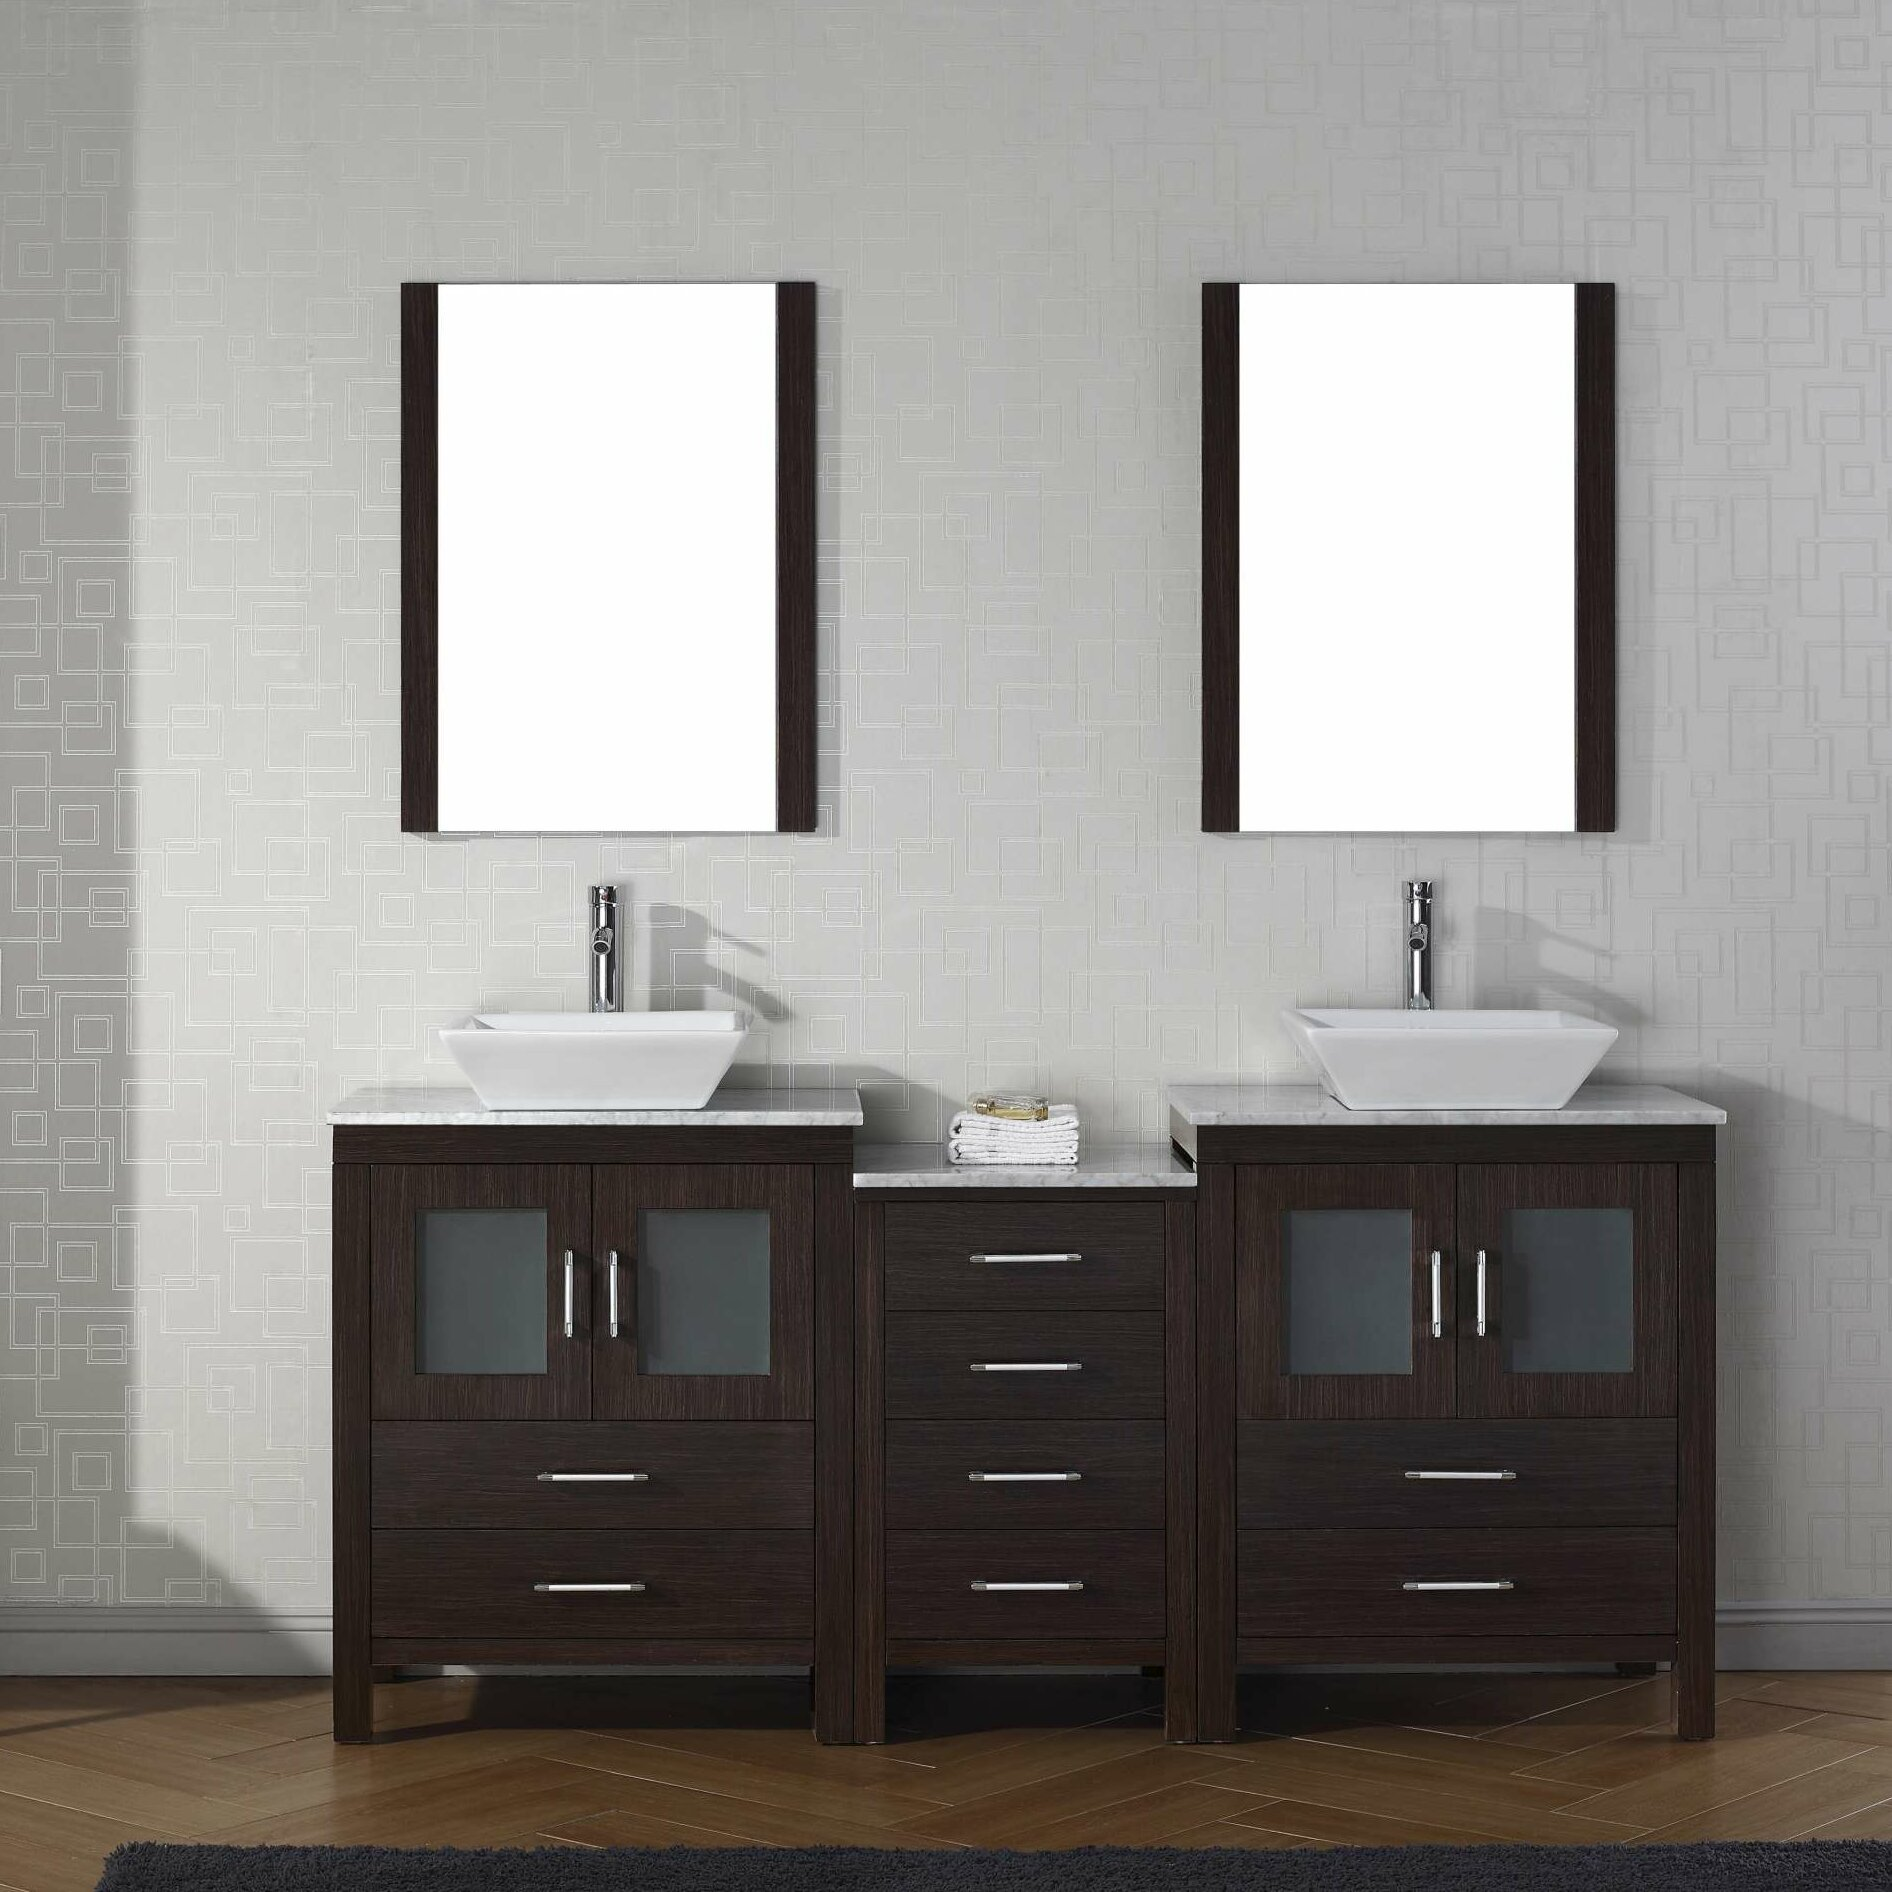 Mercury Row Cartagena 67 Double Bathroom Vanity Set With White Marble Top And Mirror Reviews Wayfair